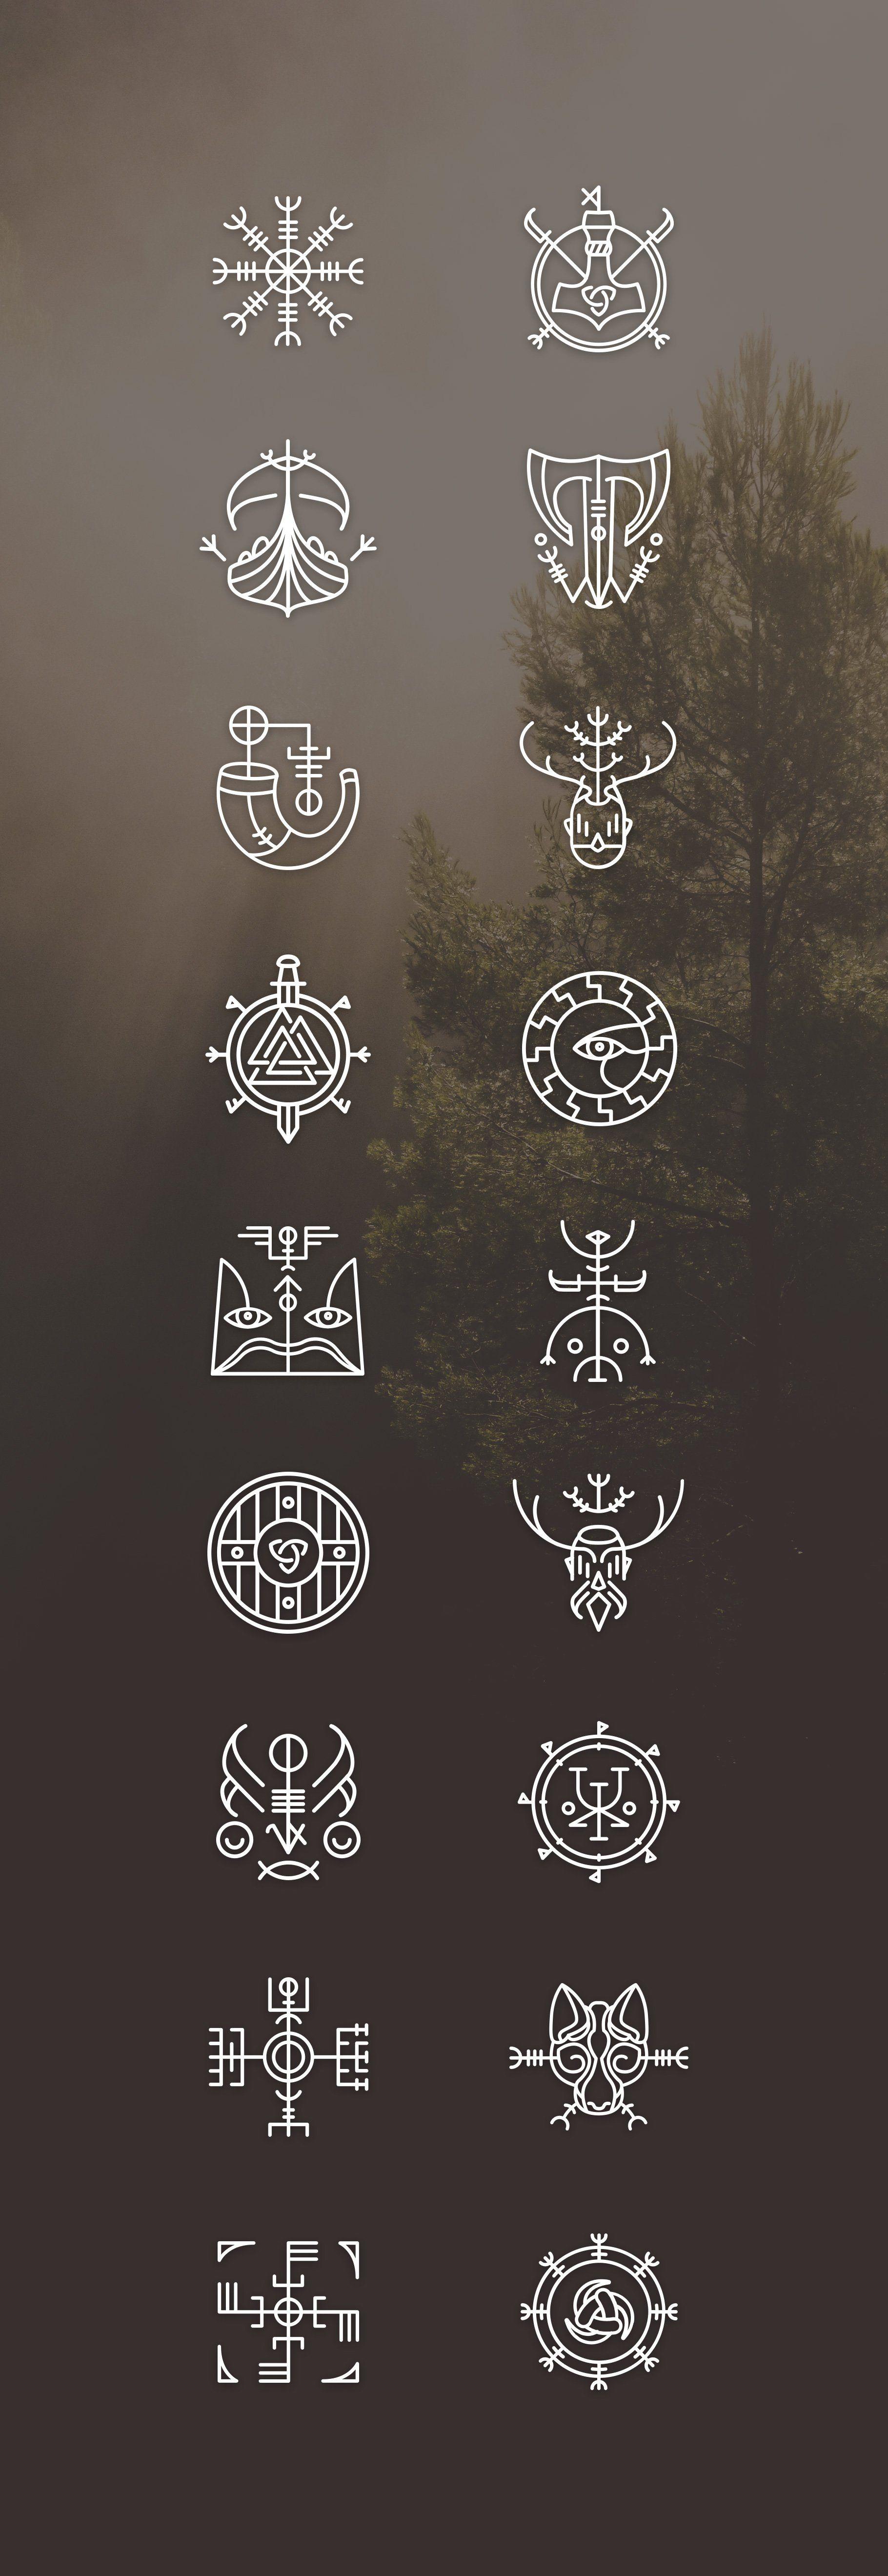 Vikons: the Striking Viking icon set by blanaroo on @creativemarket